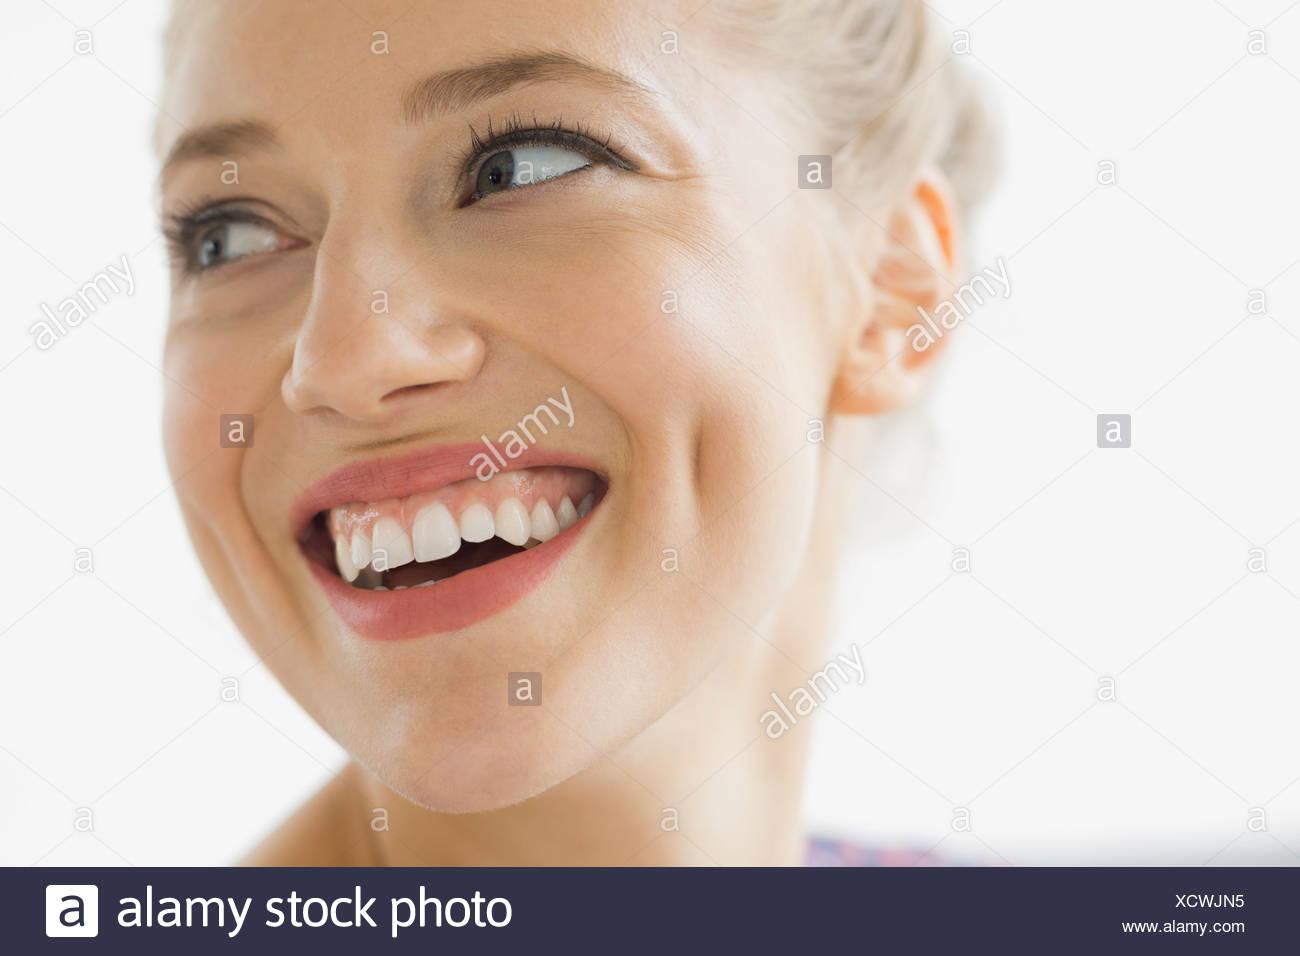 Close-up portrait of beautiful woman - Stock Image